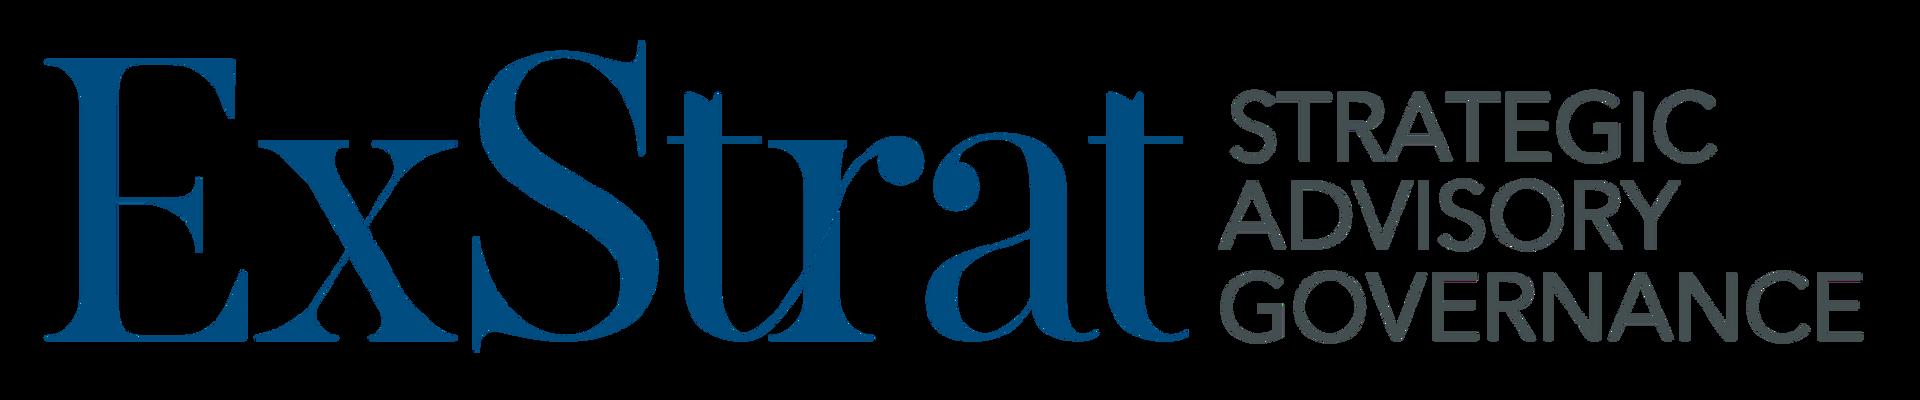 Full logo Final - Web.png